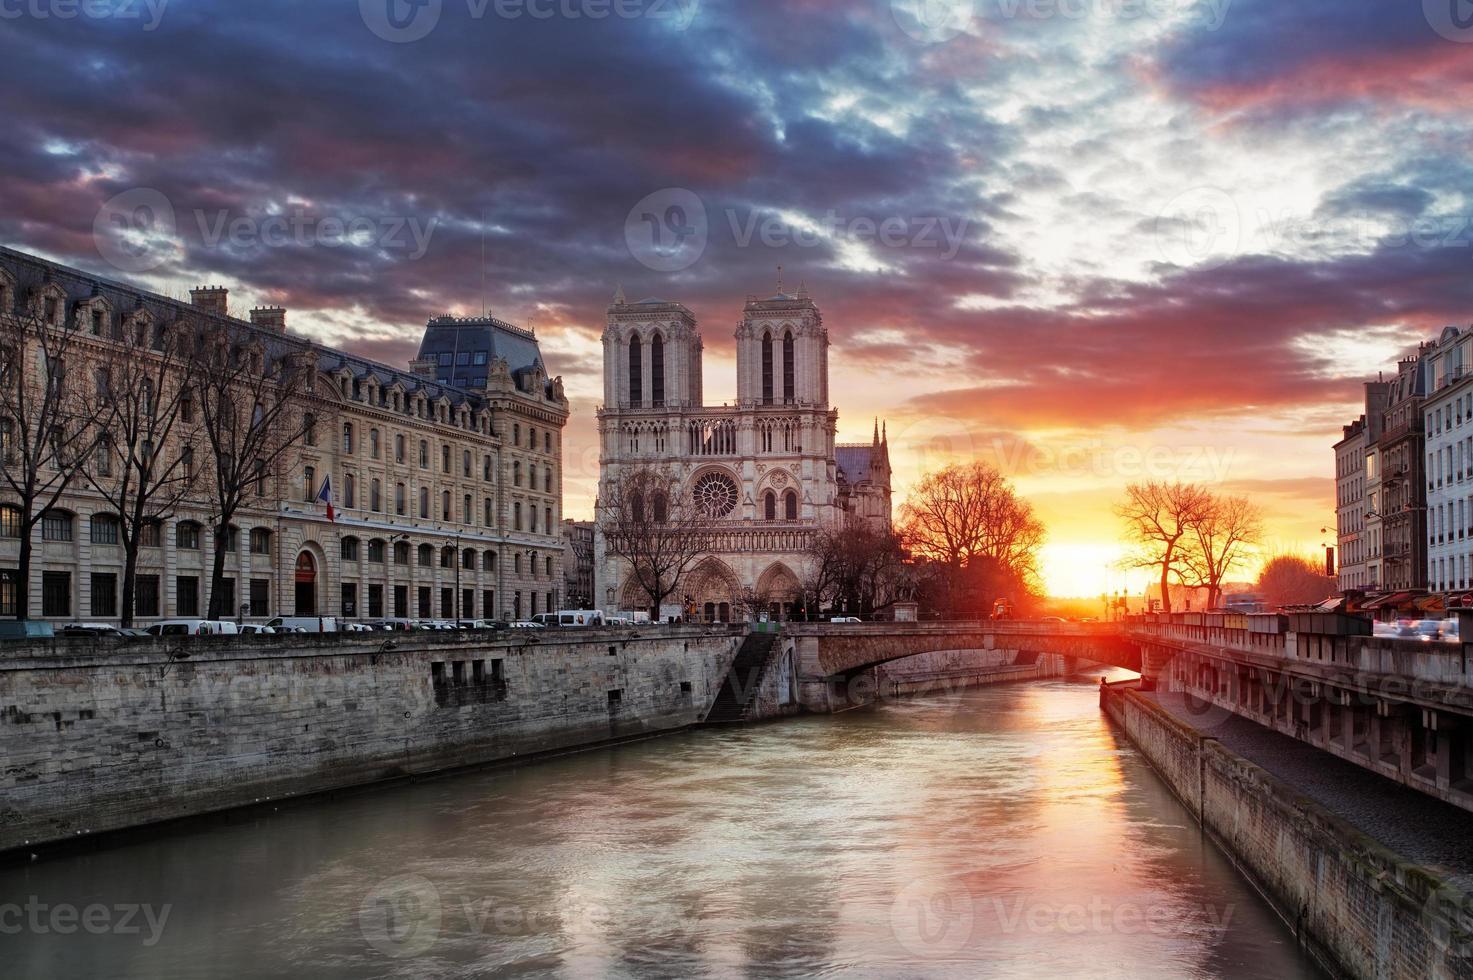 Cattedrale di Notre Dame all'alba a Parigi, Francia foto